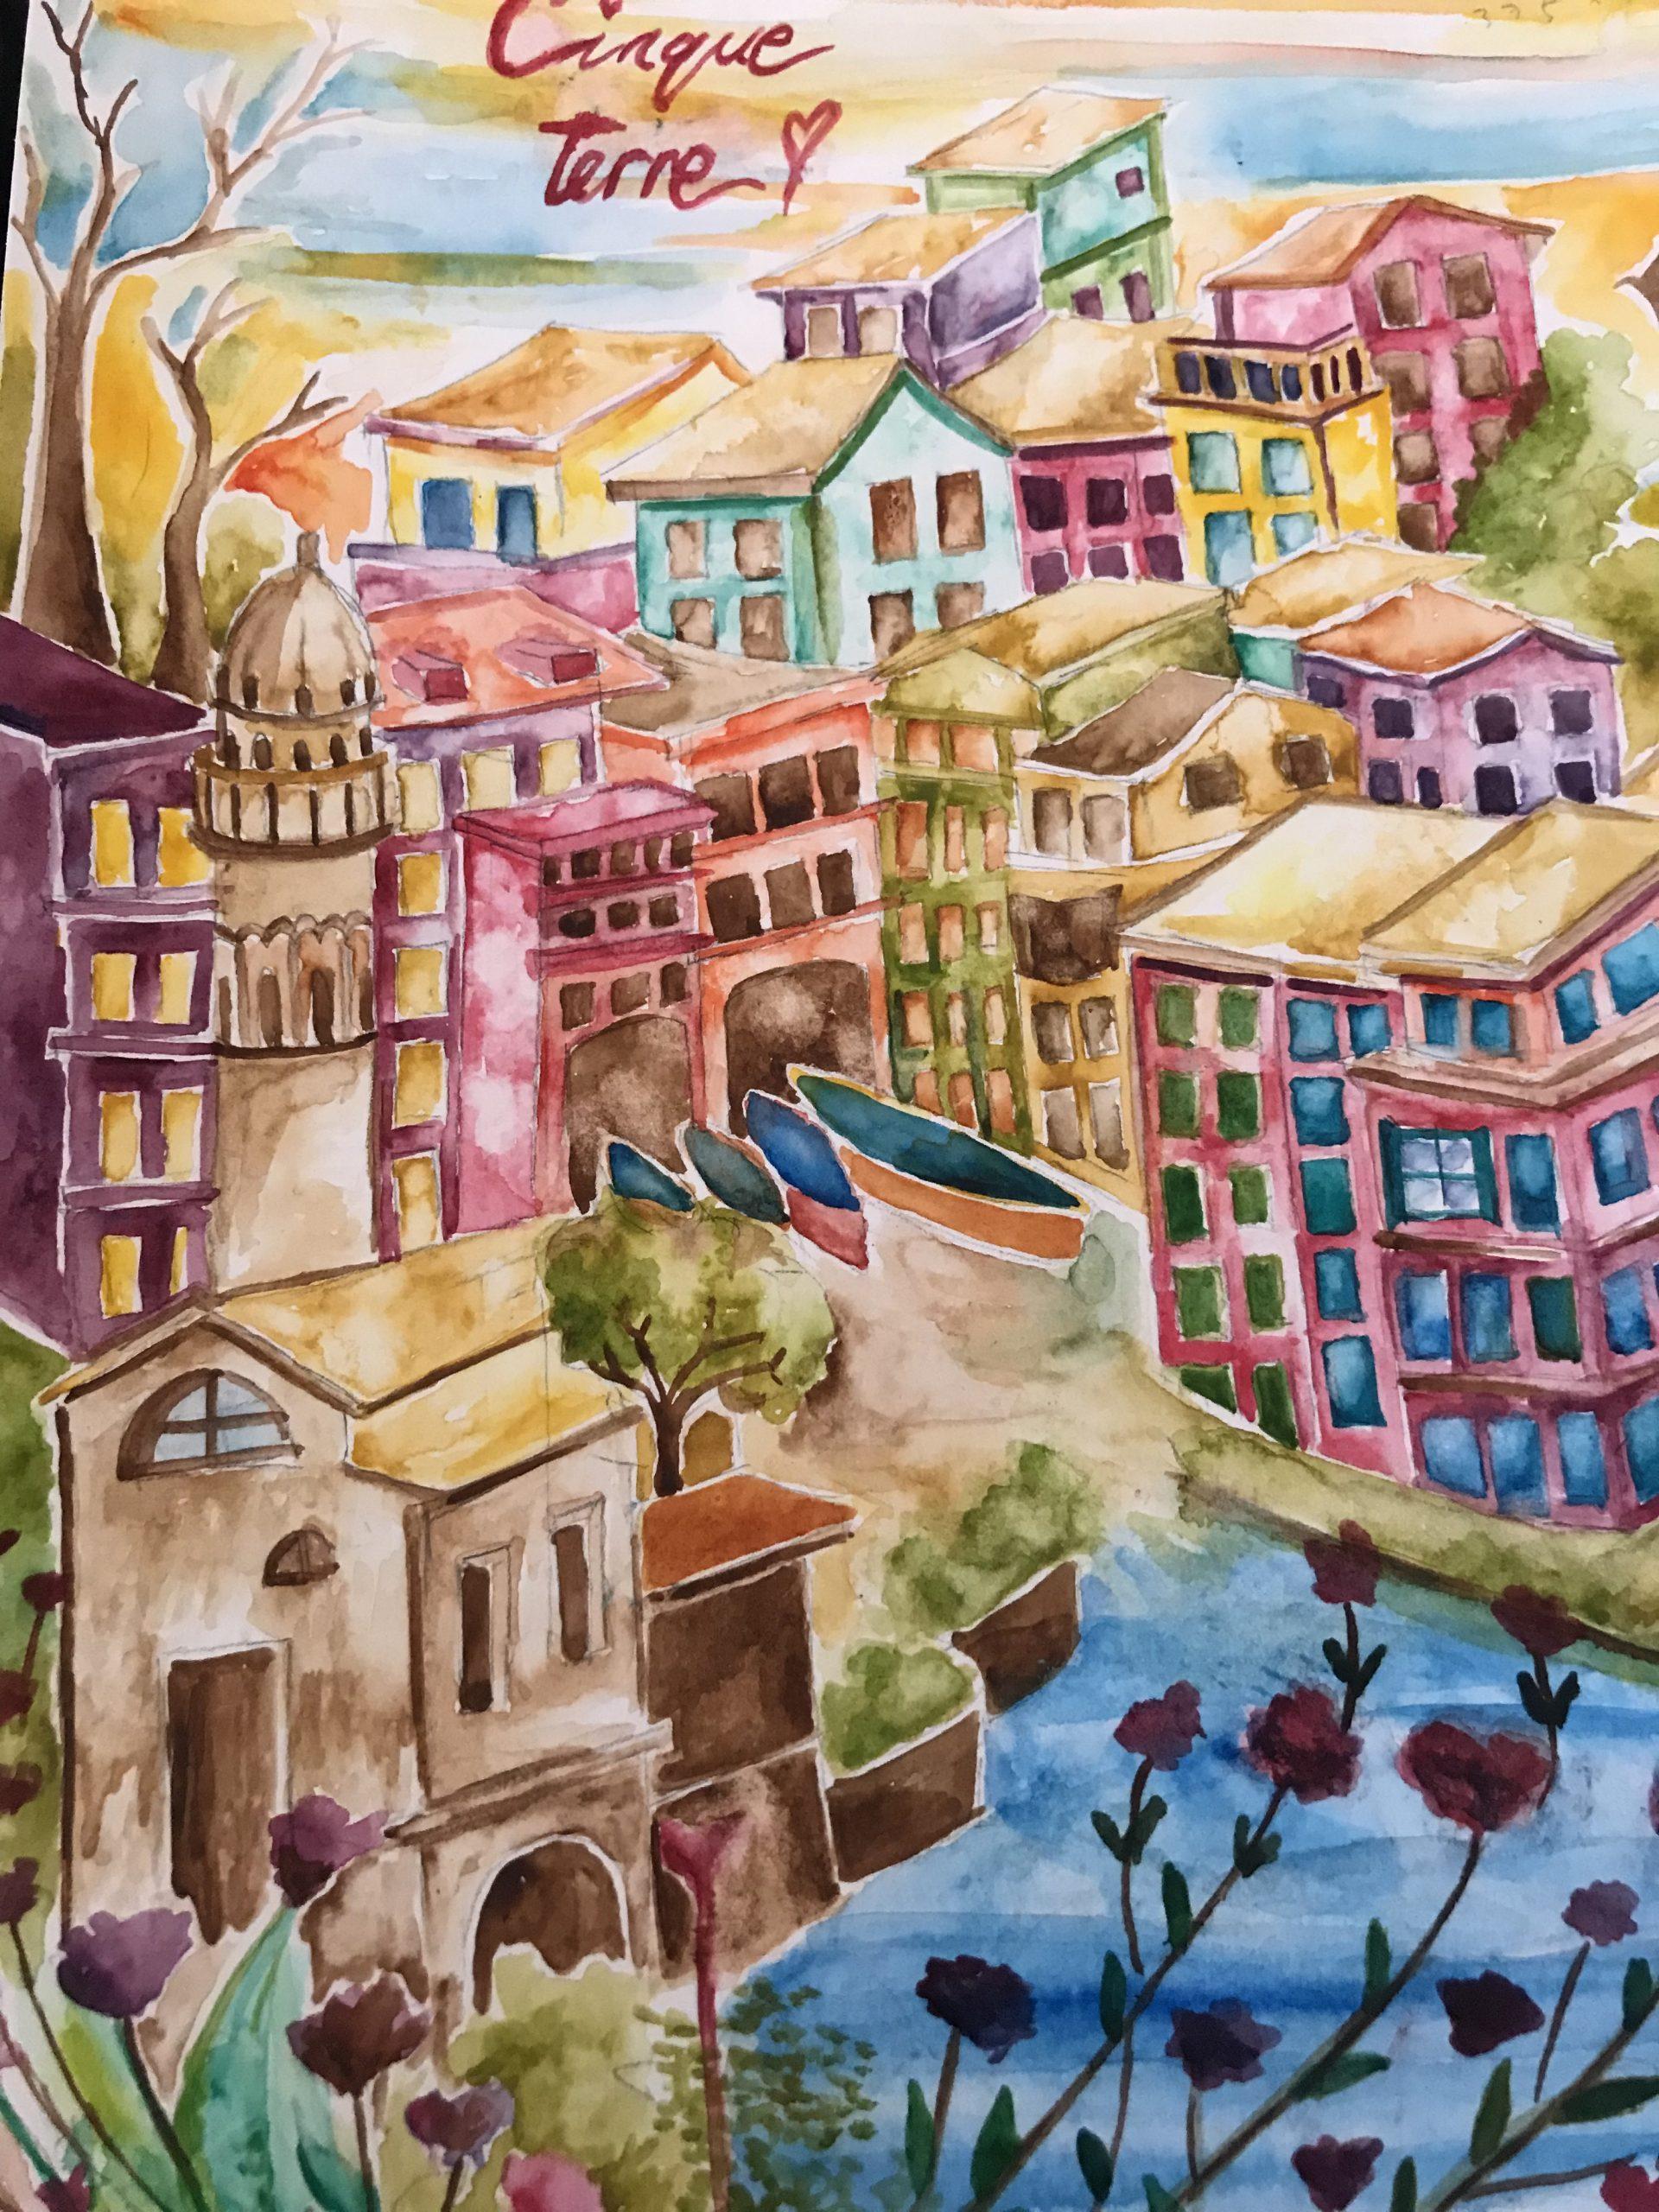 The Colorful Gem of Cinque Terre